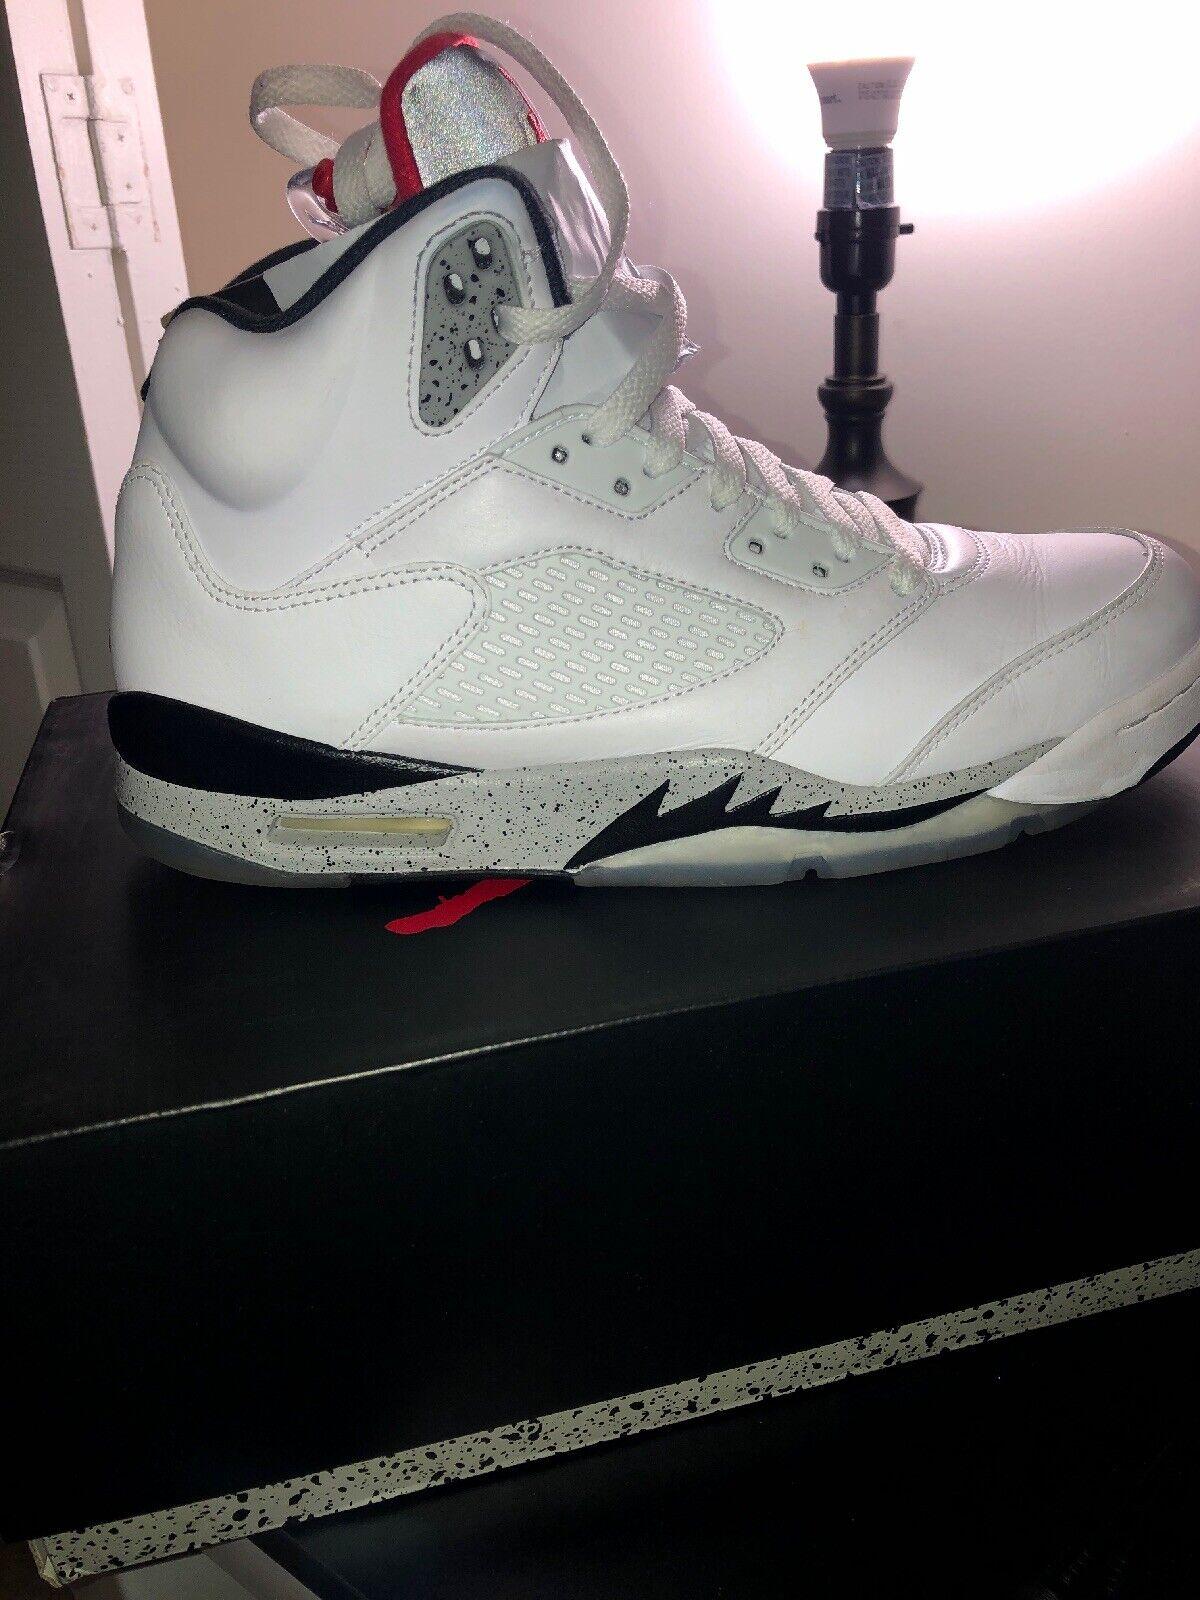 Air Jordan Retro 5  White Cement,  Men's Size 9.5 pre-owned